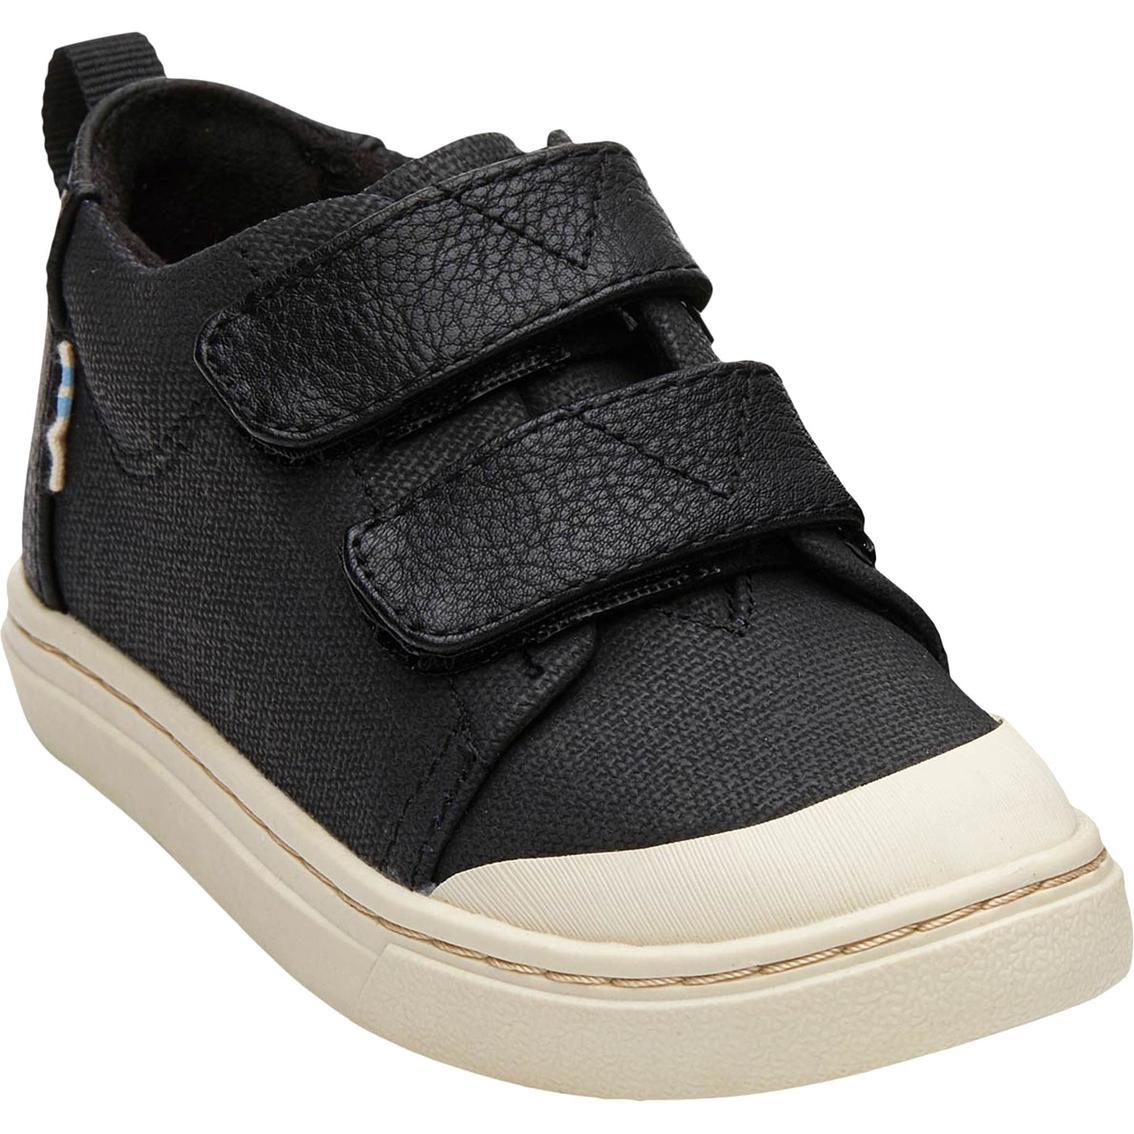 e09b3e1600c Toms Boys Textural Canvas Tiny Lenny Mid Sneakers